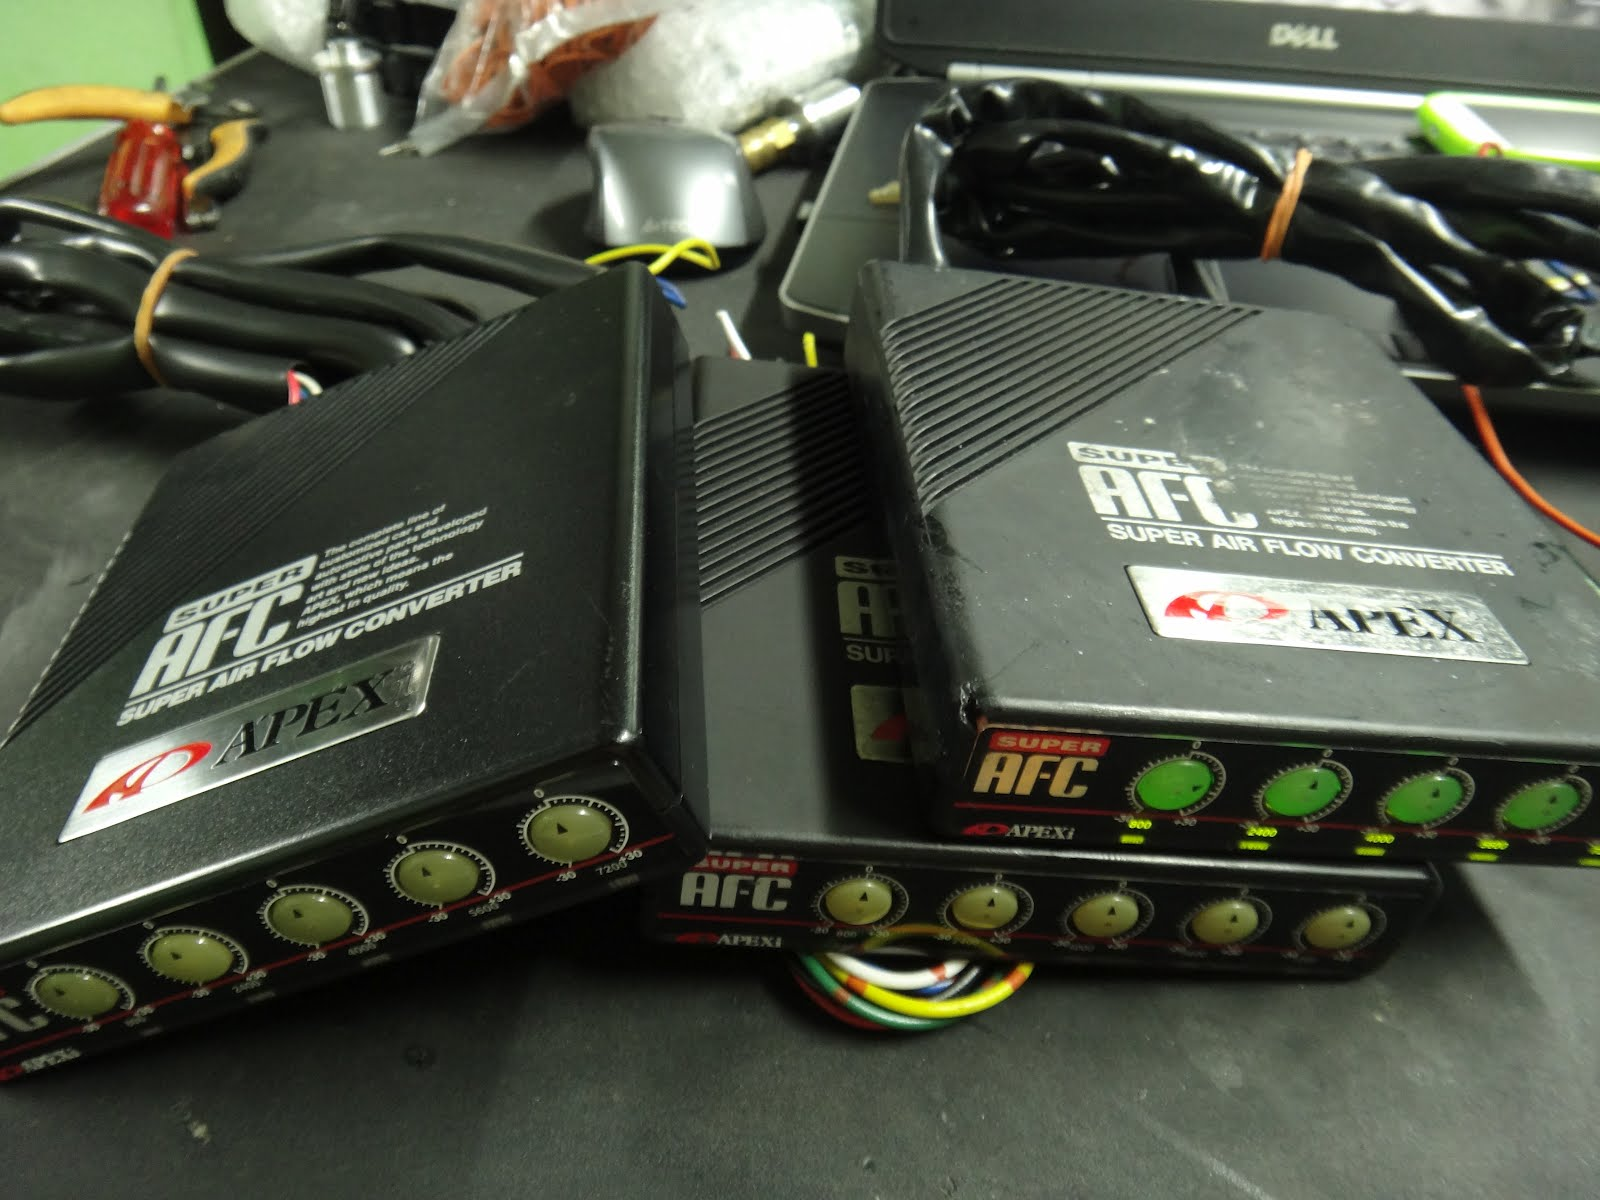 Nanajue Garage Apexi Safc 5 Buttonwhatsapp Sms Call 012 4280145 Wiring Diagram At August 27 2012